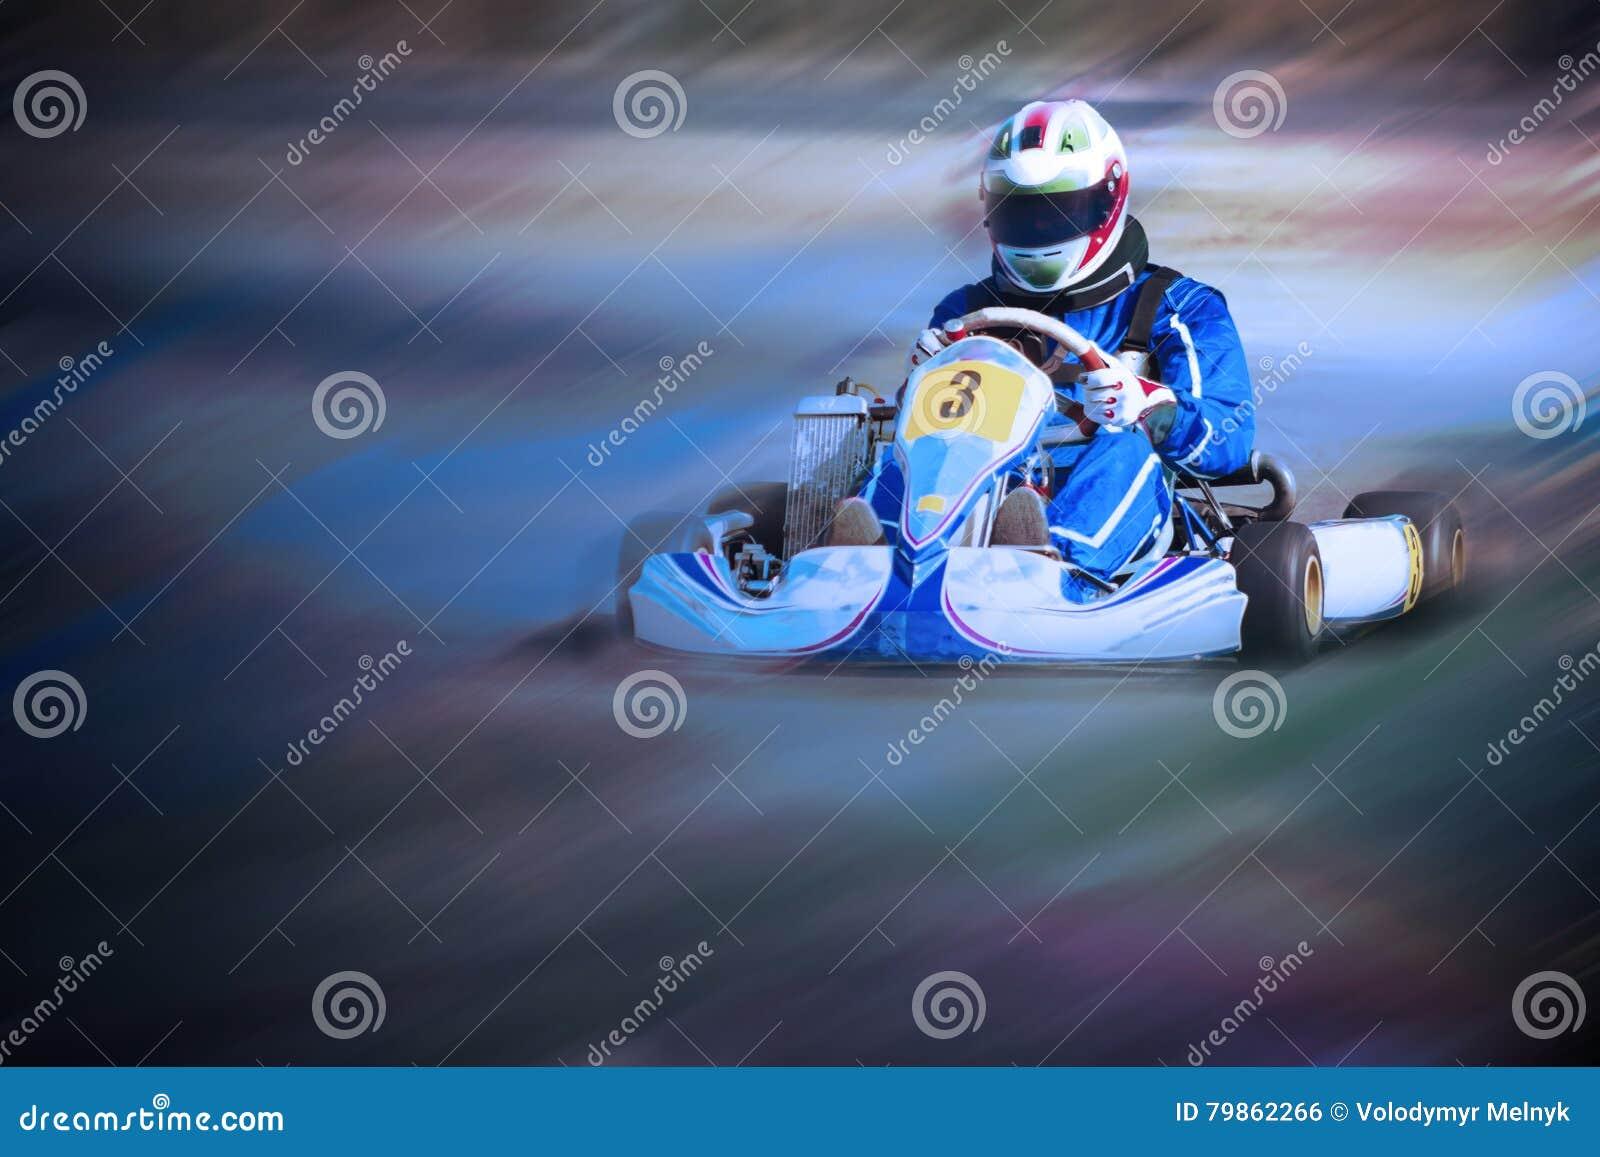 Karting - motorista no capacete no circuito do kart